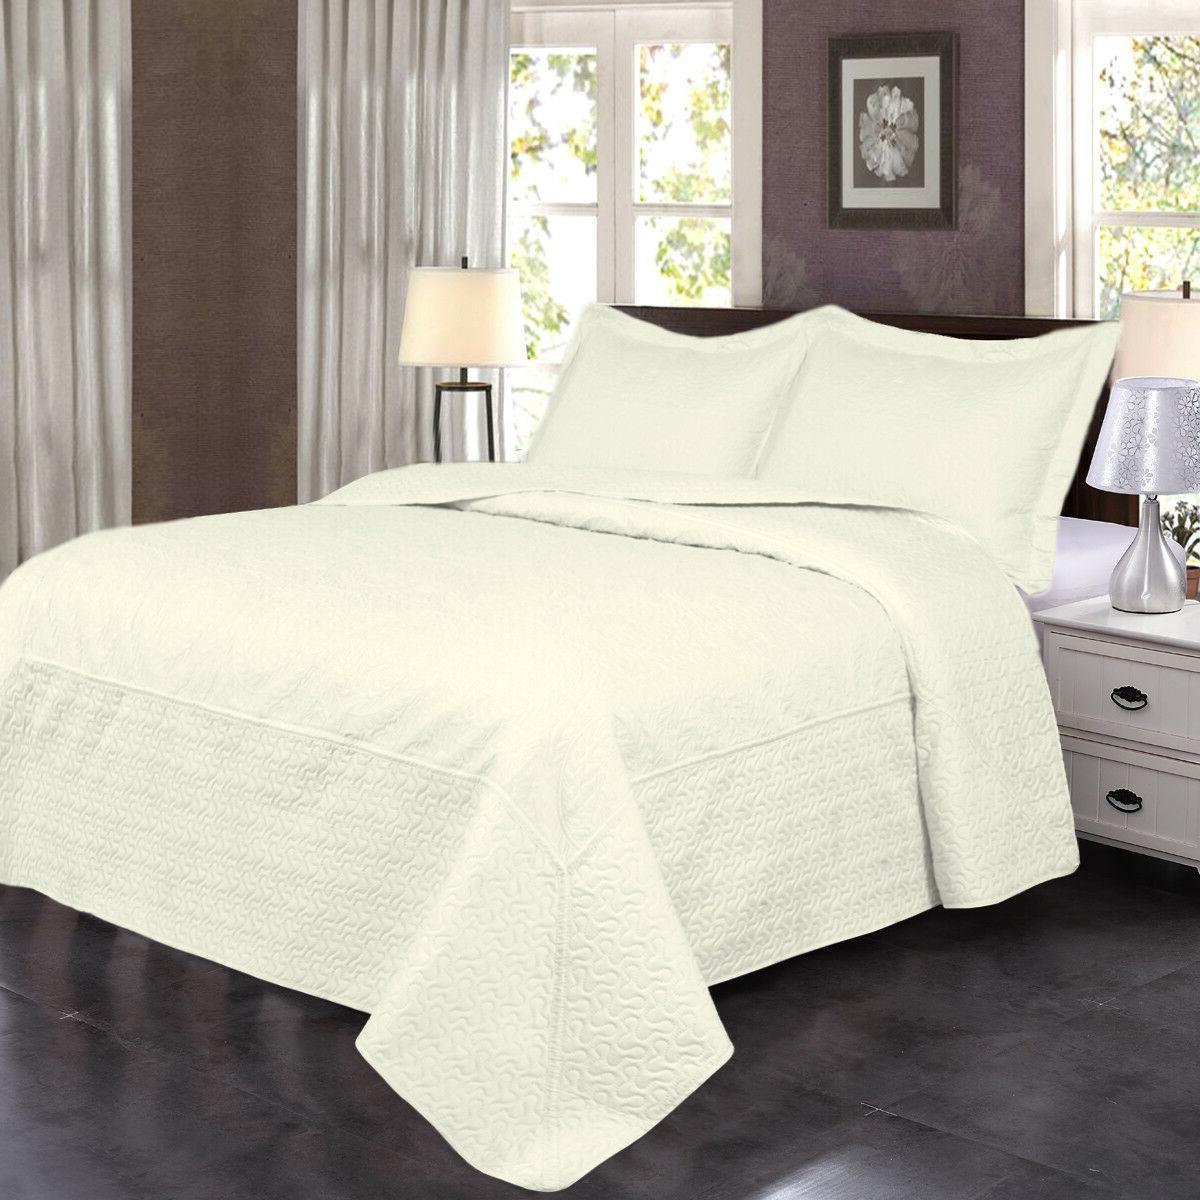 3 Solid Quilt Set & Lightweight Bedspread